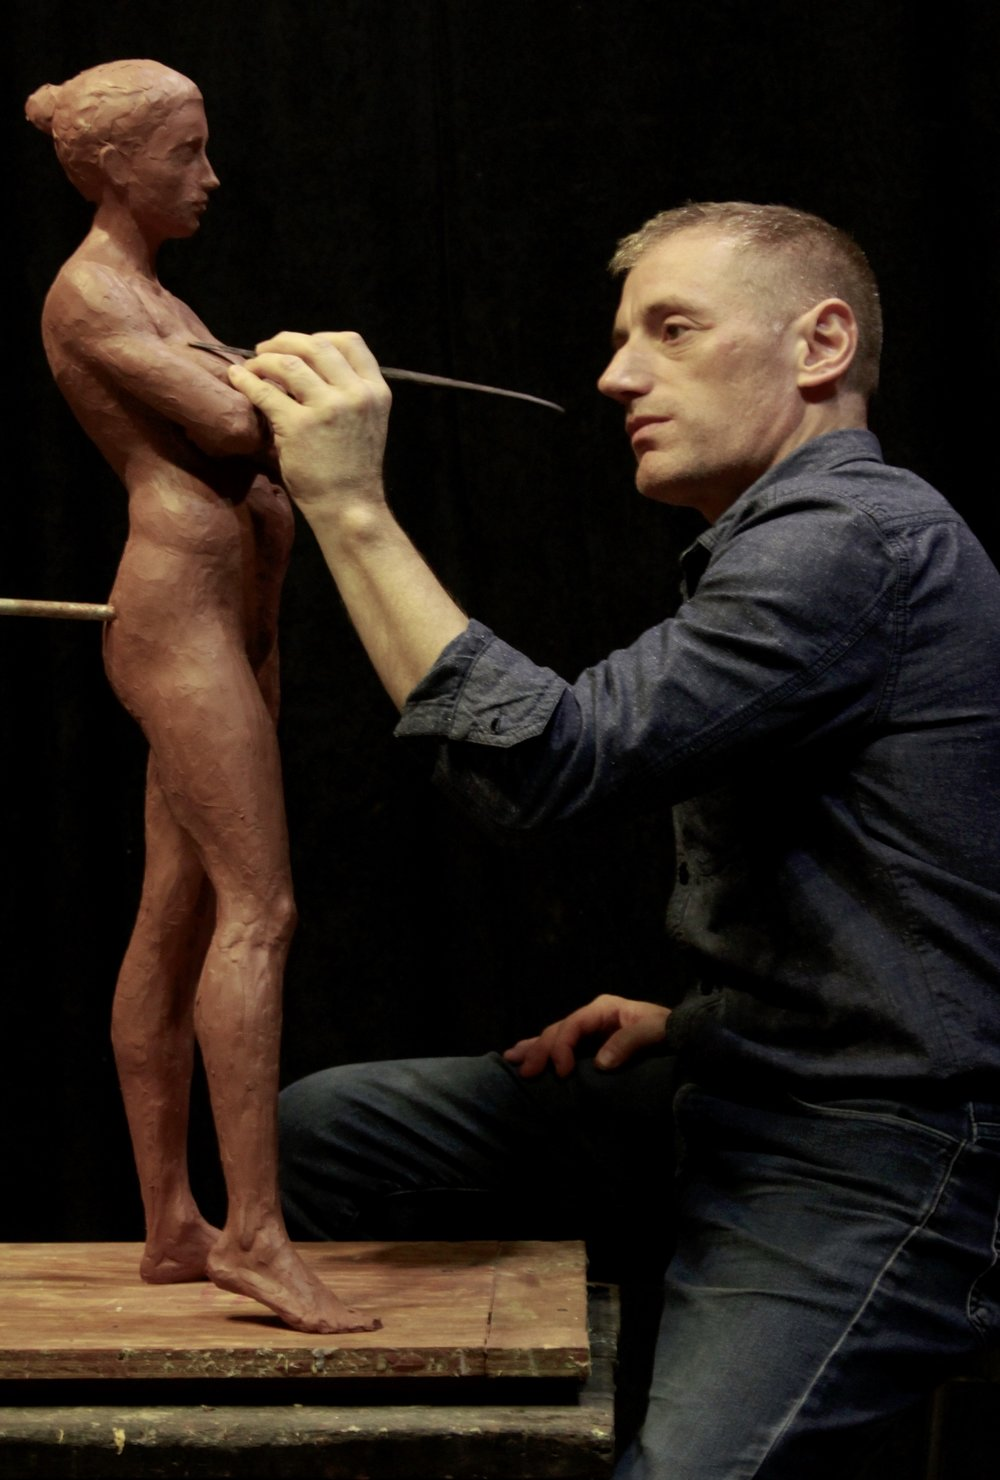 Sculpting.jpg